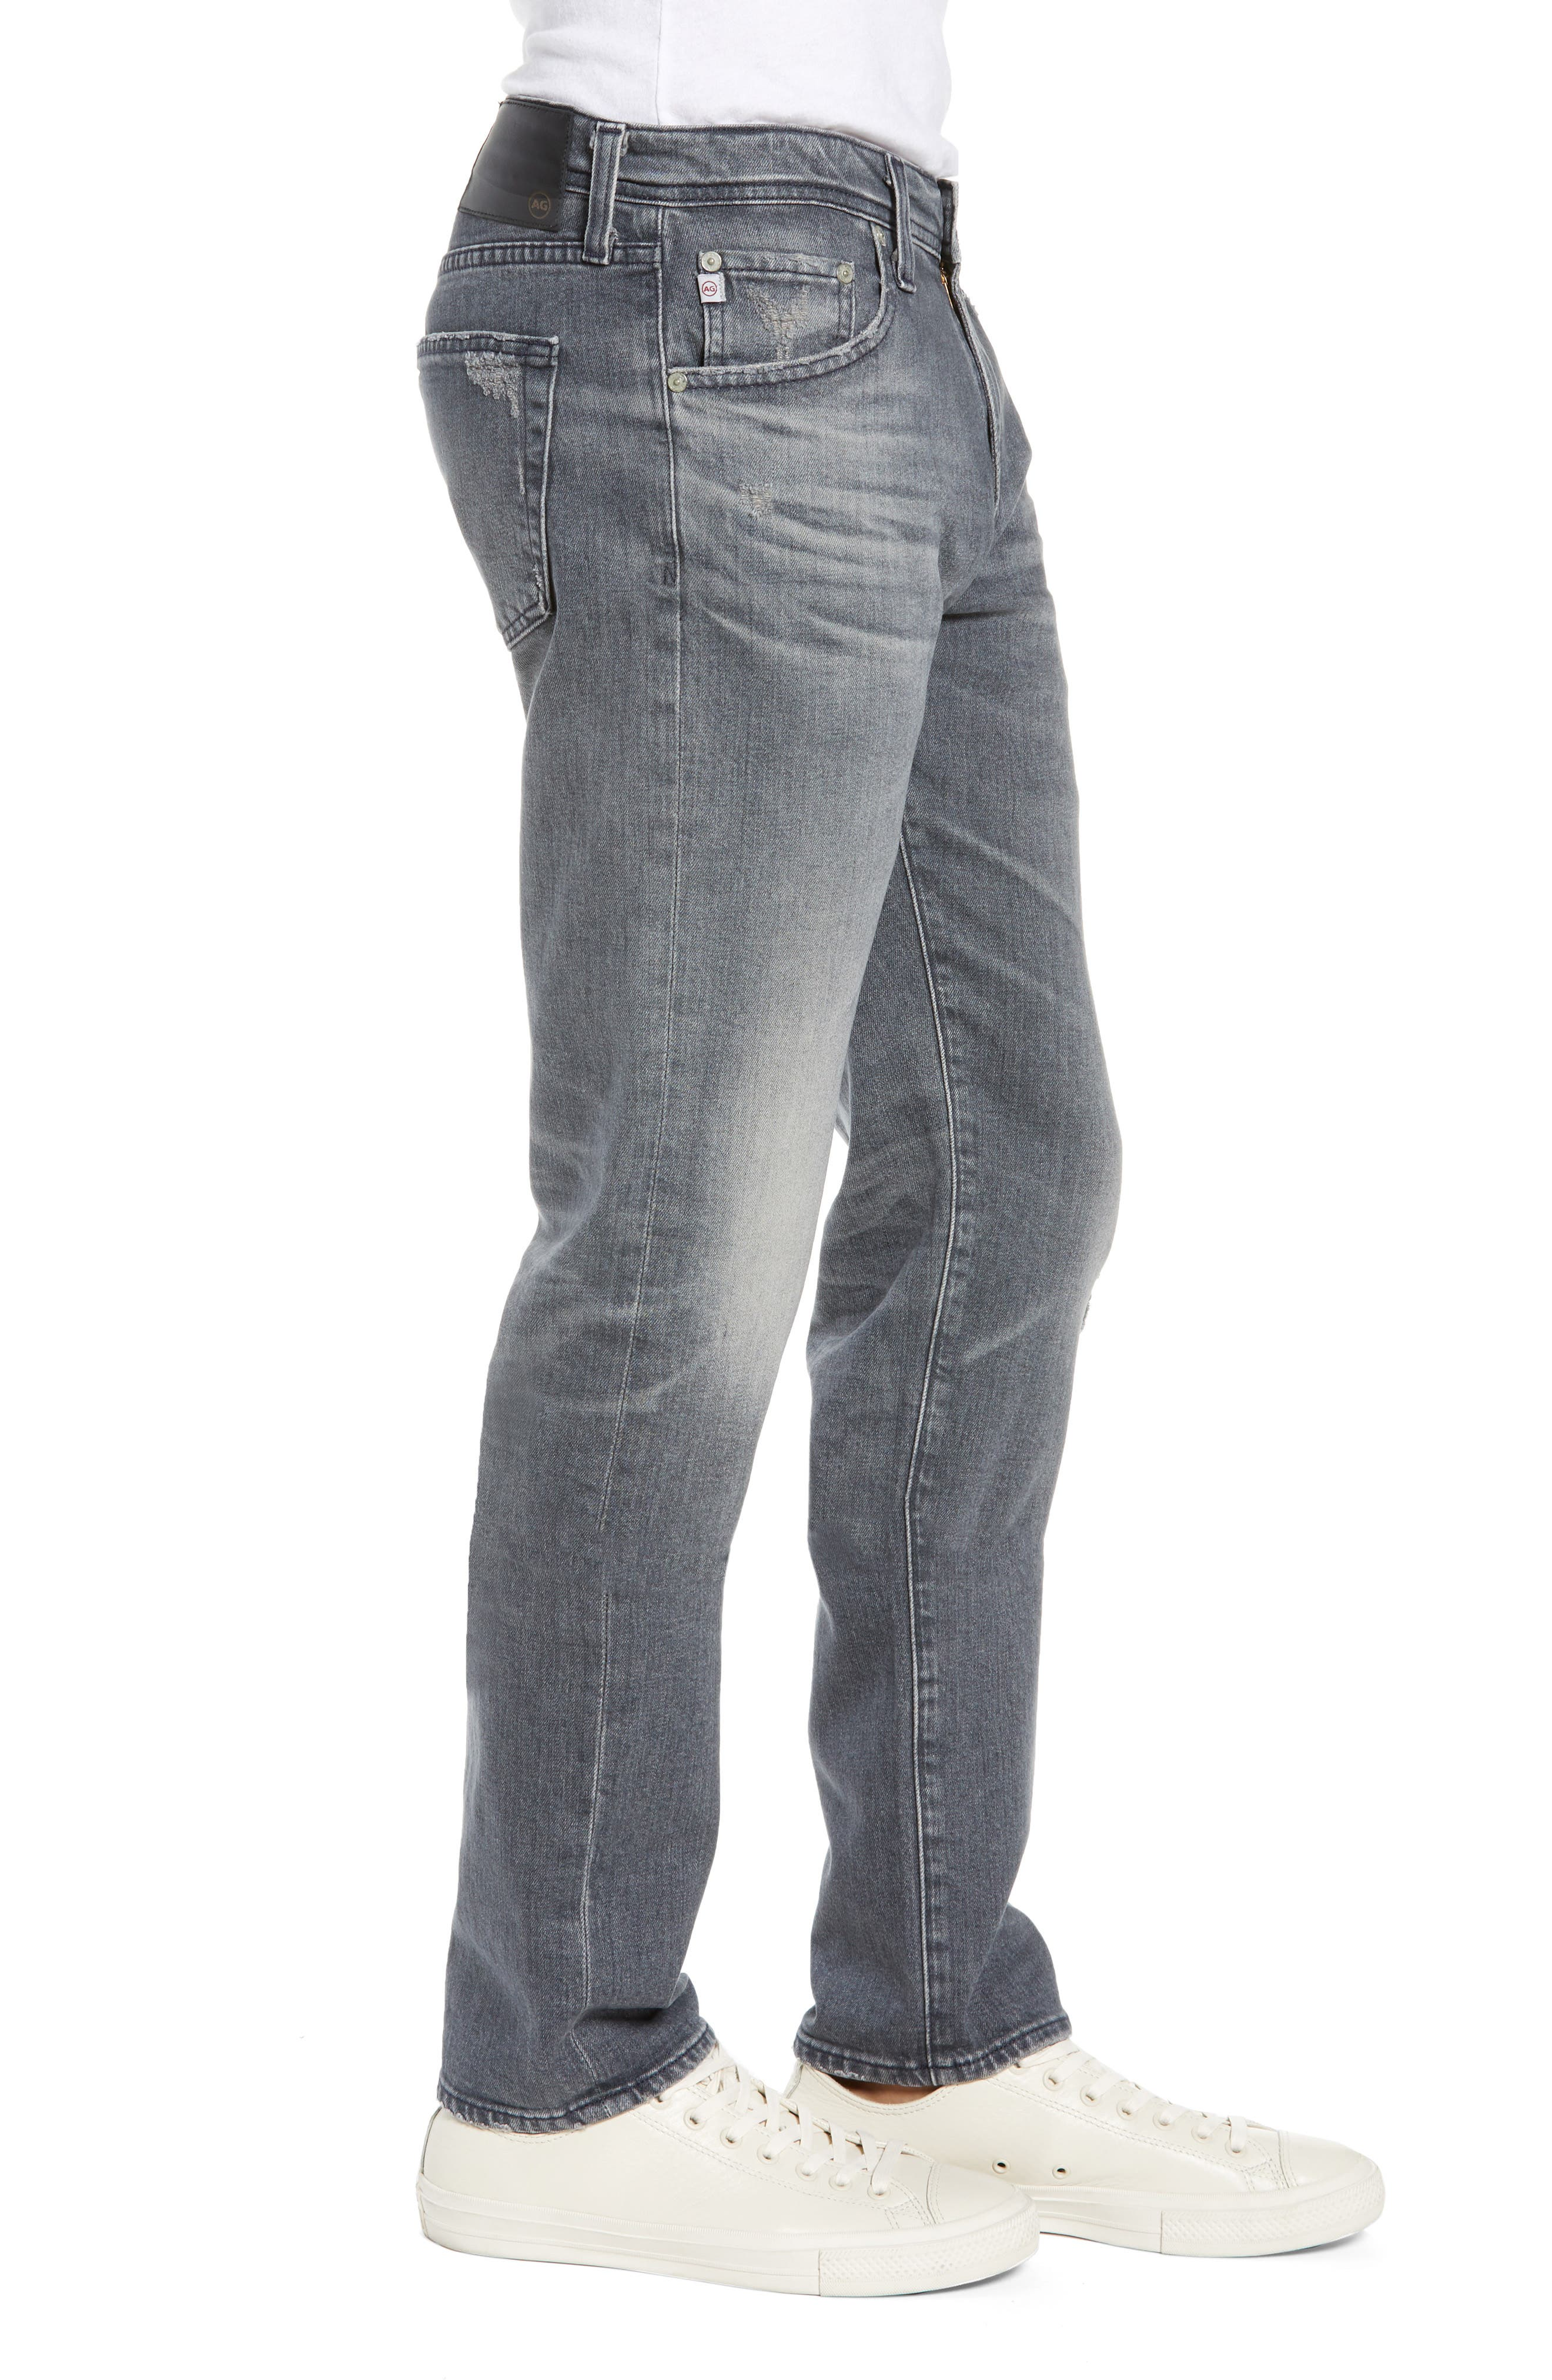 Tellis Slim Fit Jeans,                             Alternate thumbnail 3, color,                             8 YEARS CONJURE